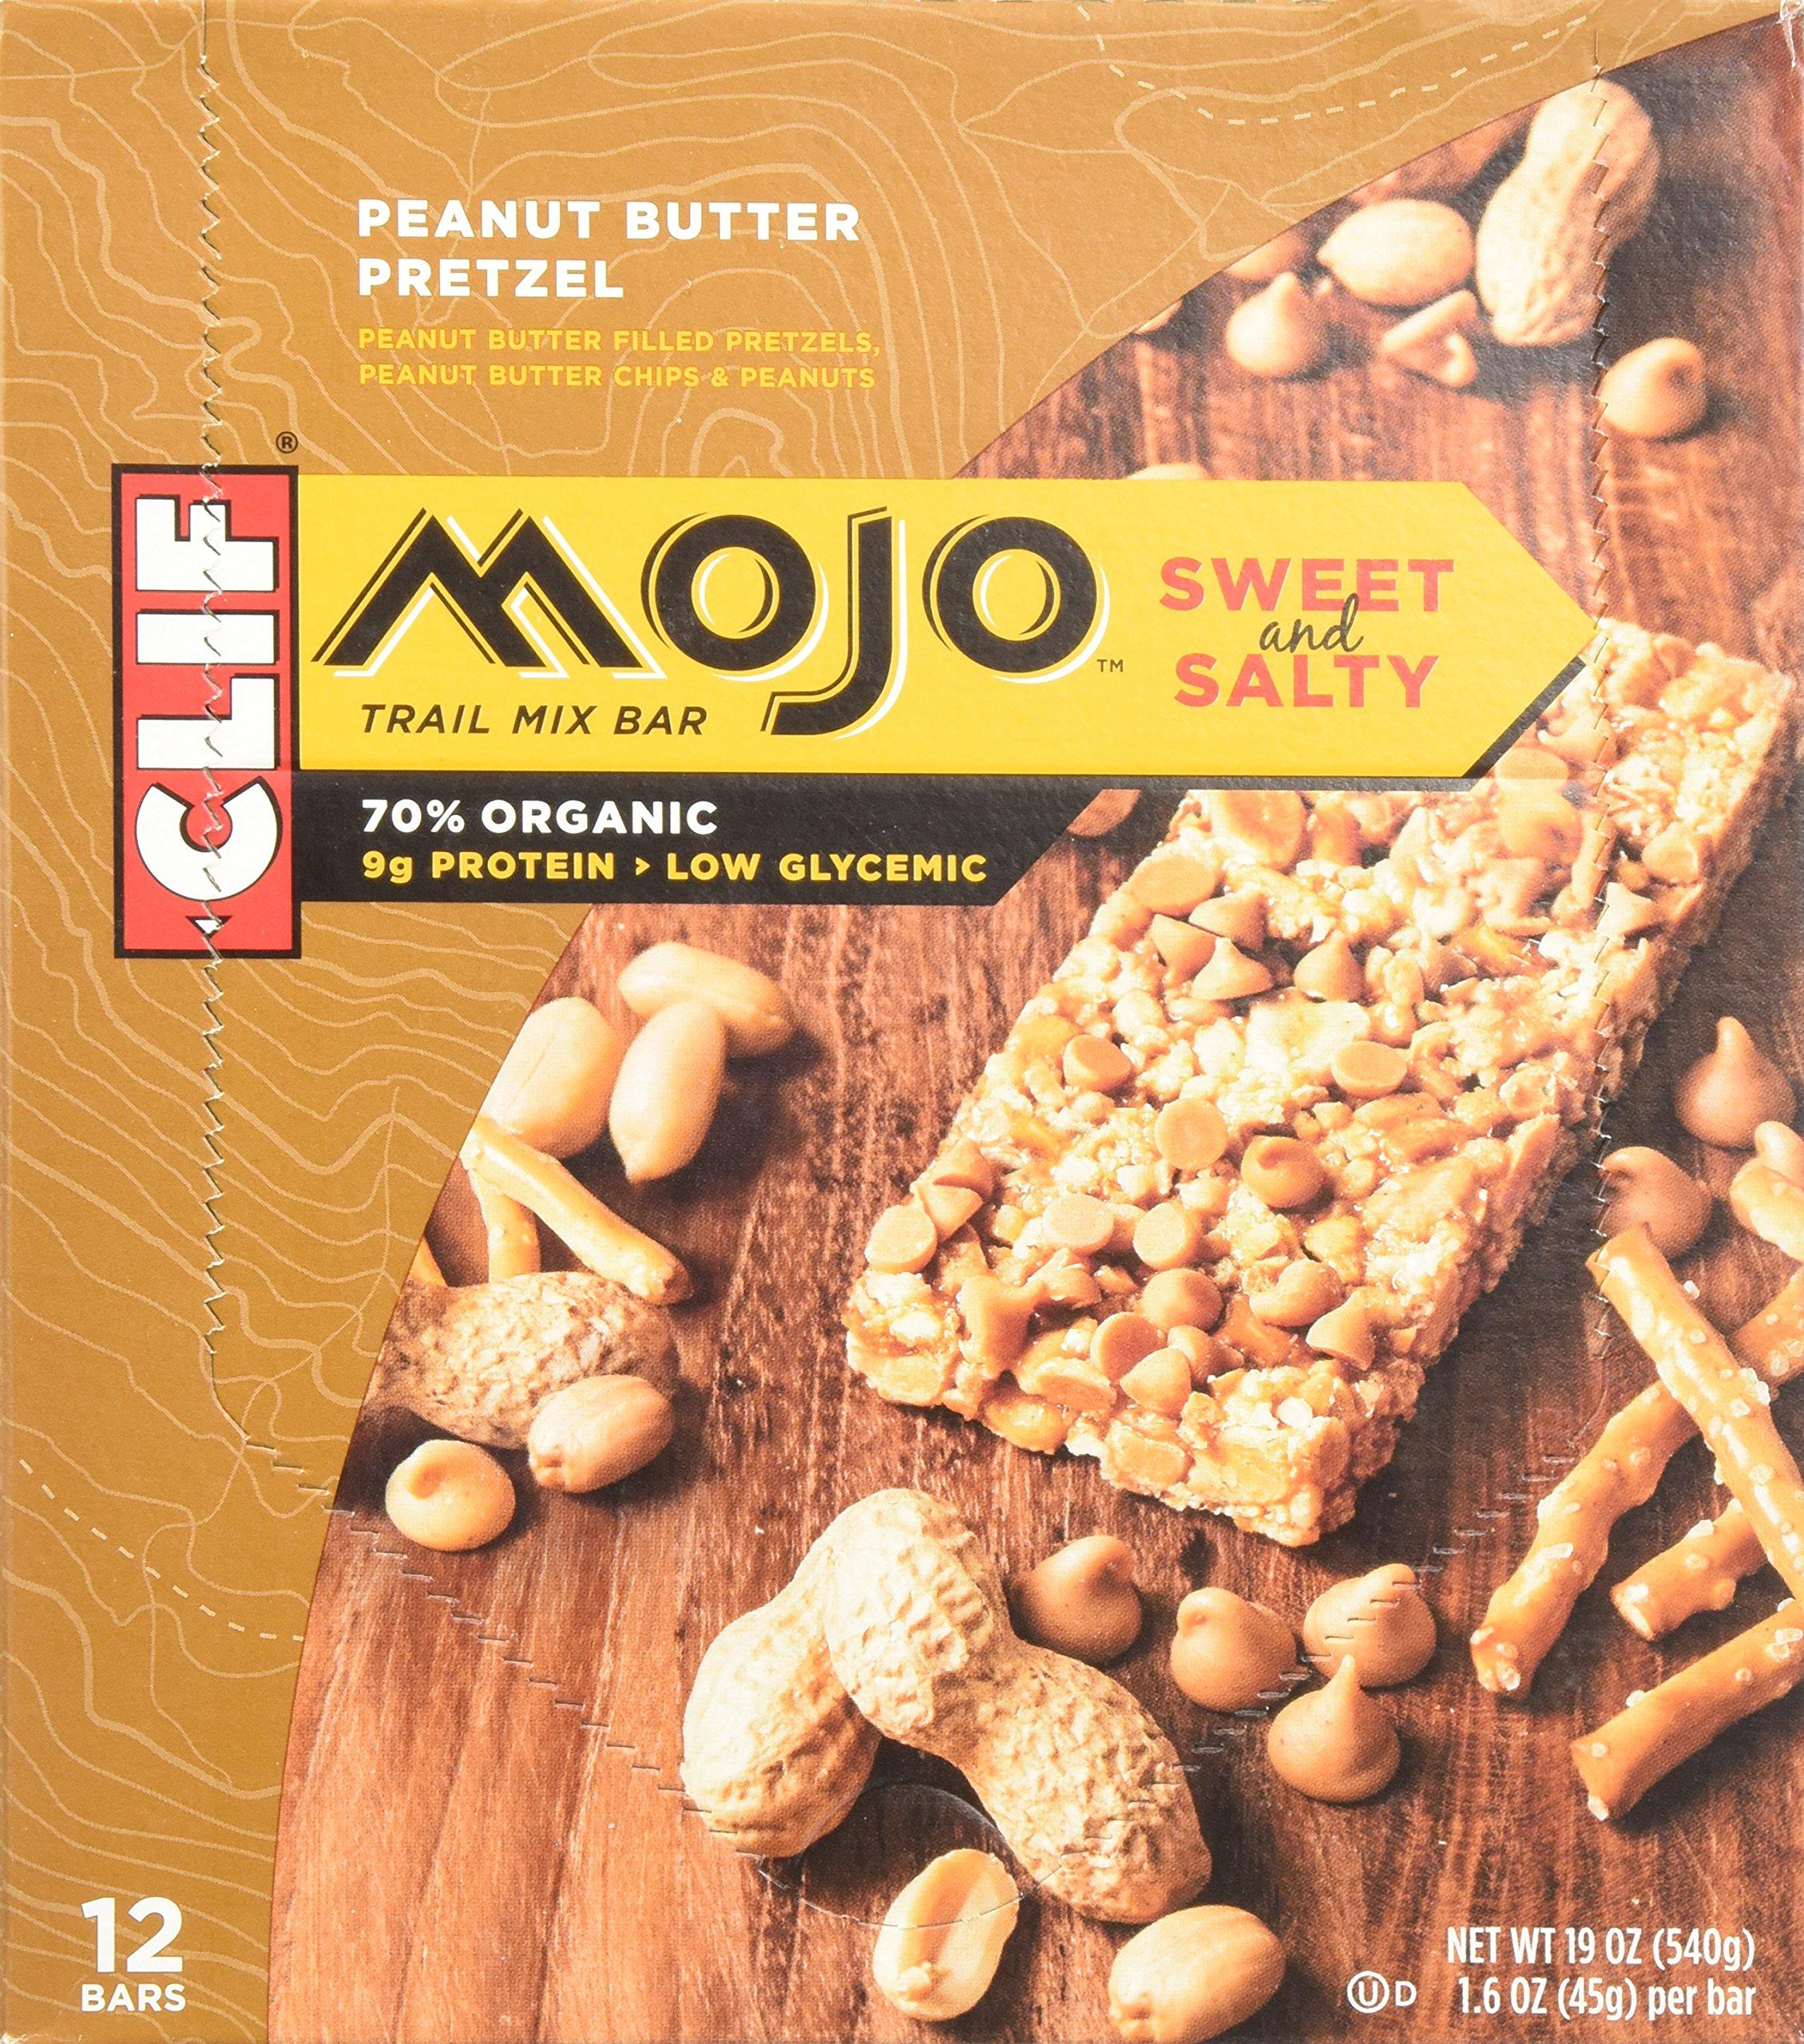 Clif Mojo Bar, Peanut Butter Pretzel, Net Wt. 19.08 Oz. 12 Count (Pack of 2) by Clif Bar (Image #1)